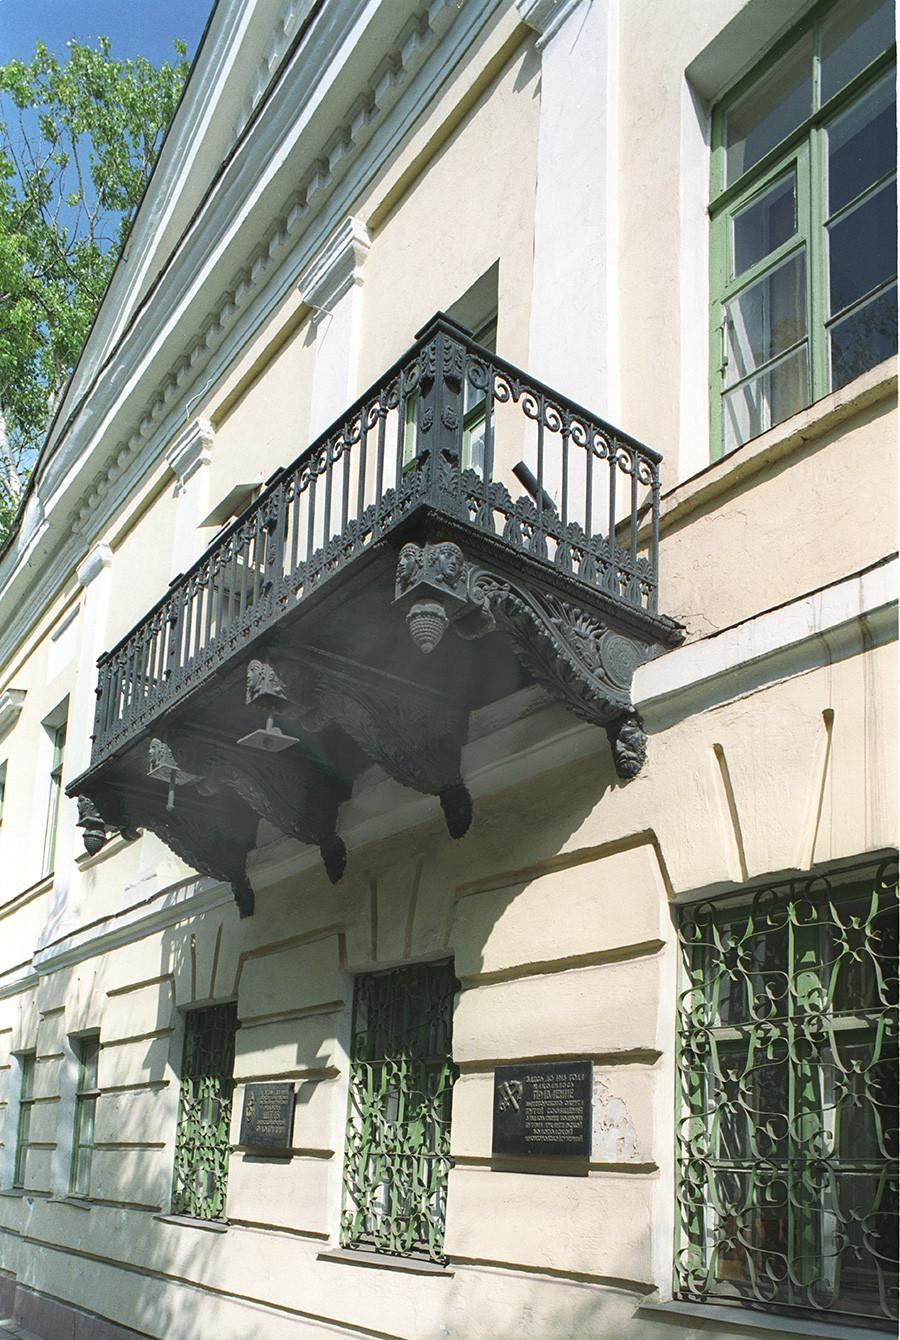 Galashevsky mansion, cast iron balcony. August 28, 2006